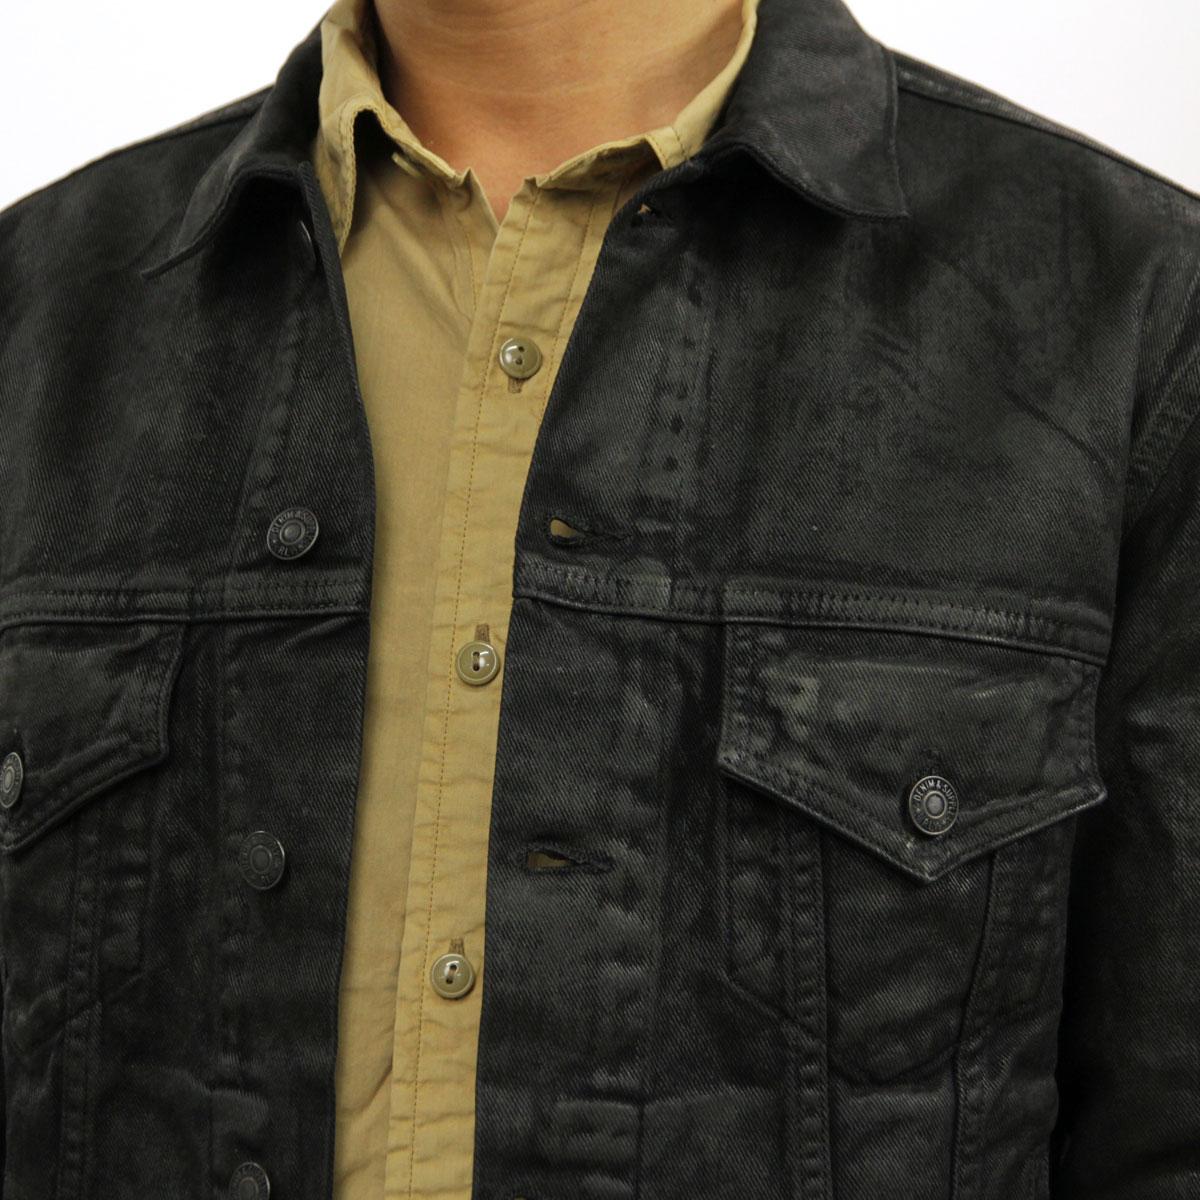 Black Supply Ralph And D00s20 Article Men Jacket Polo Regular Denim Sheldon Laurenamp; DH92WEIY